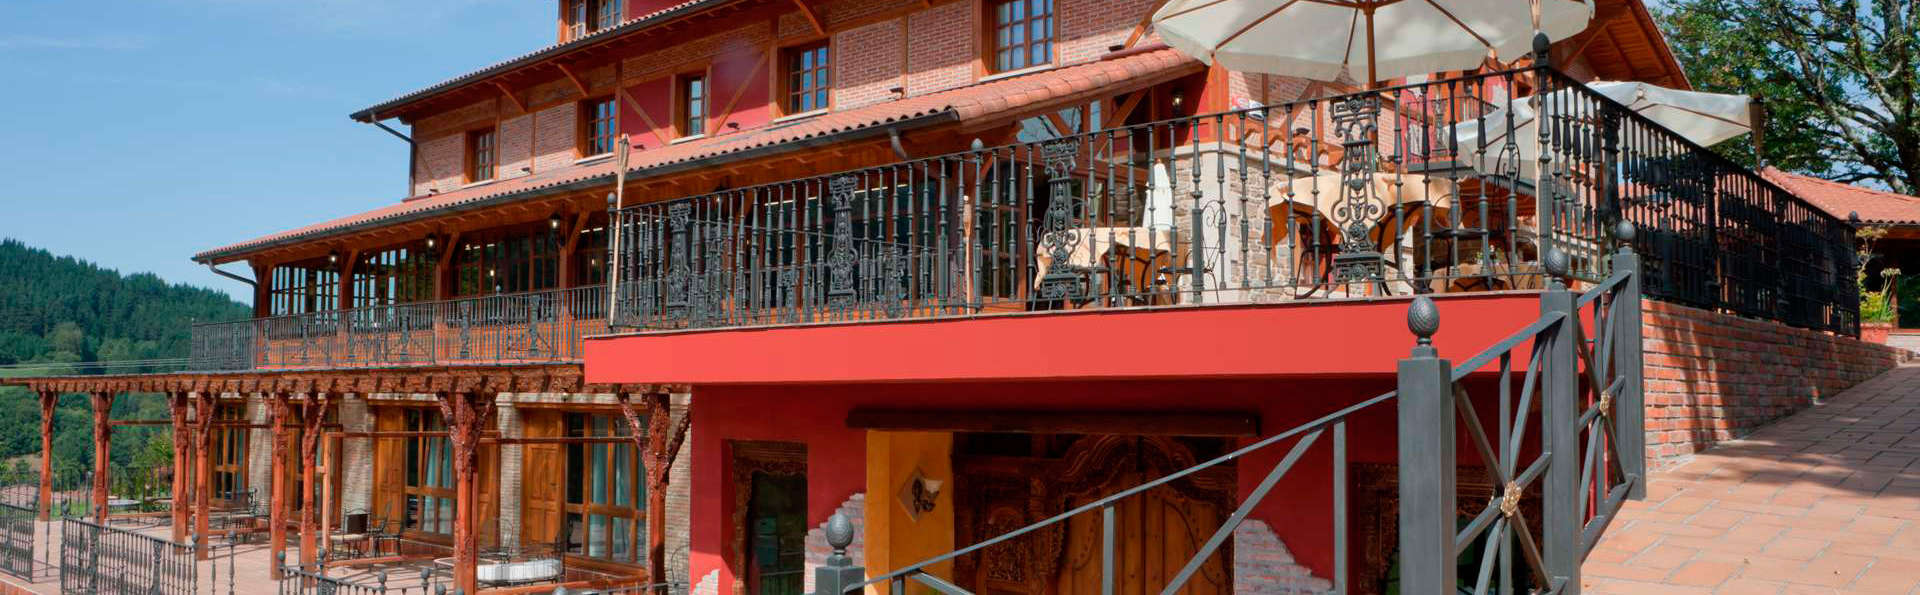 Relais du Silence Hotel & Spa Etxegana - EDIT_front.jpg